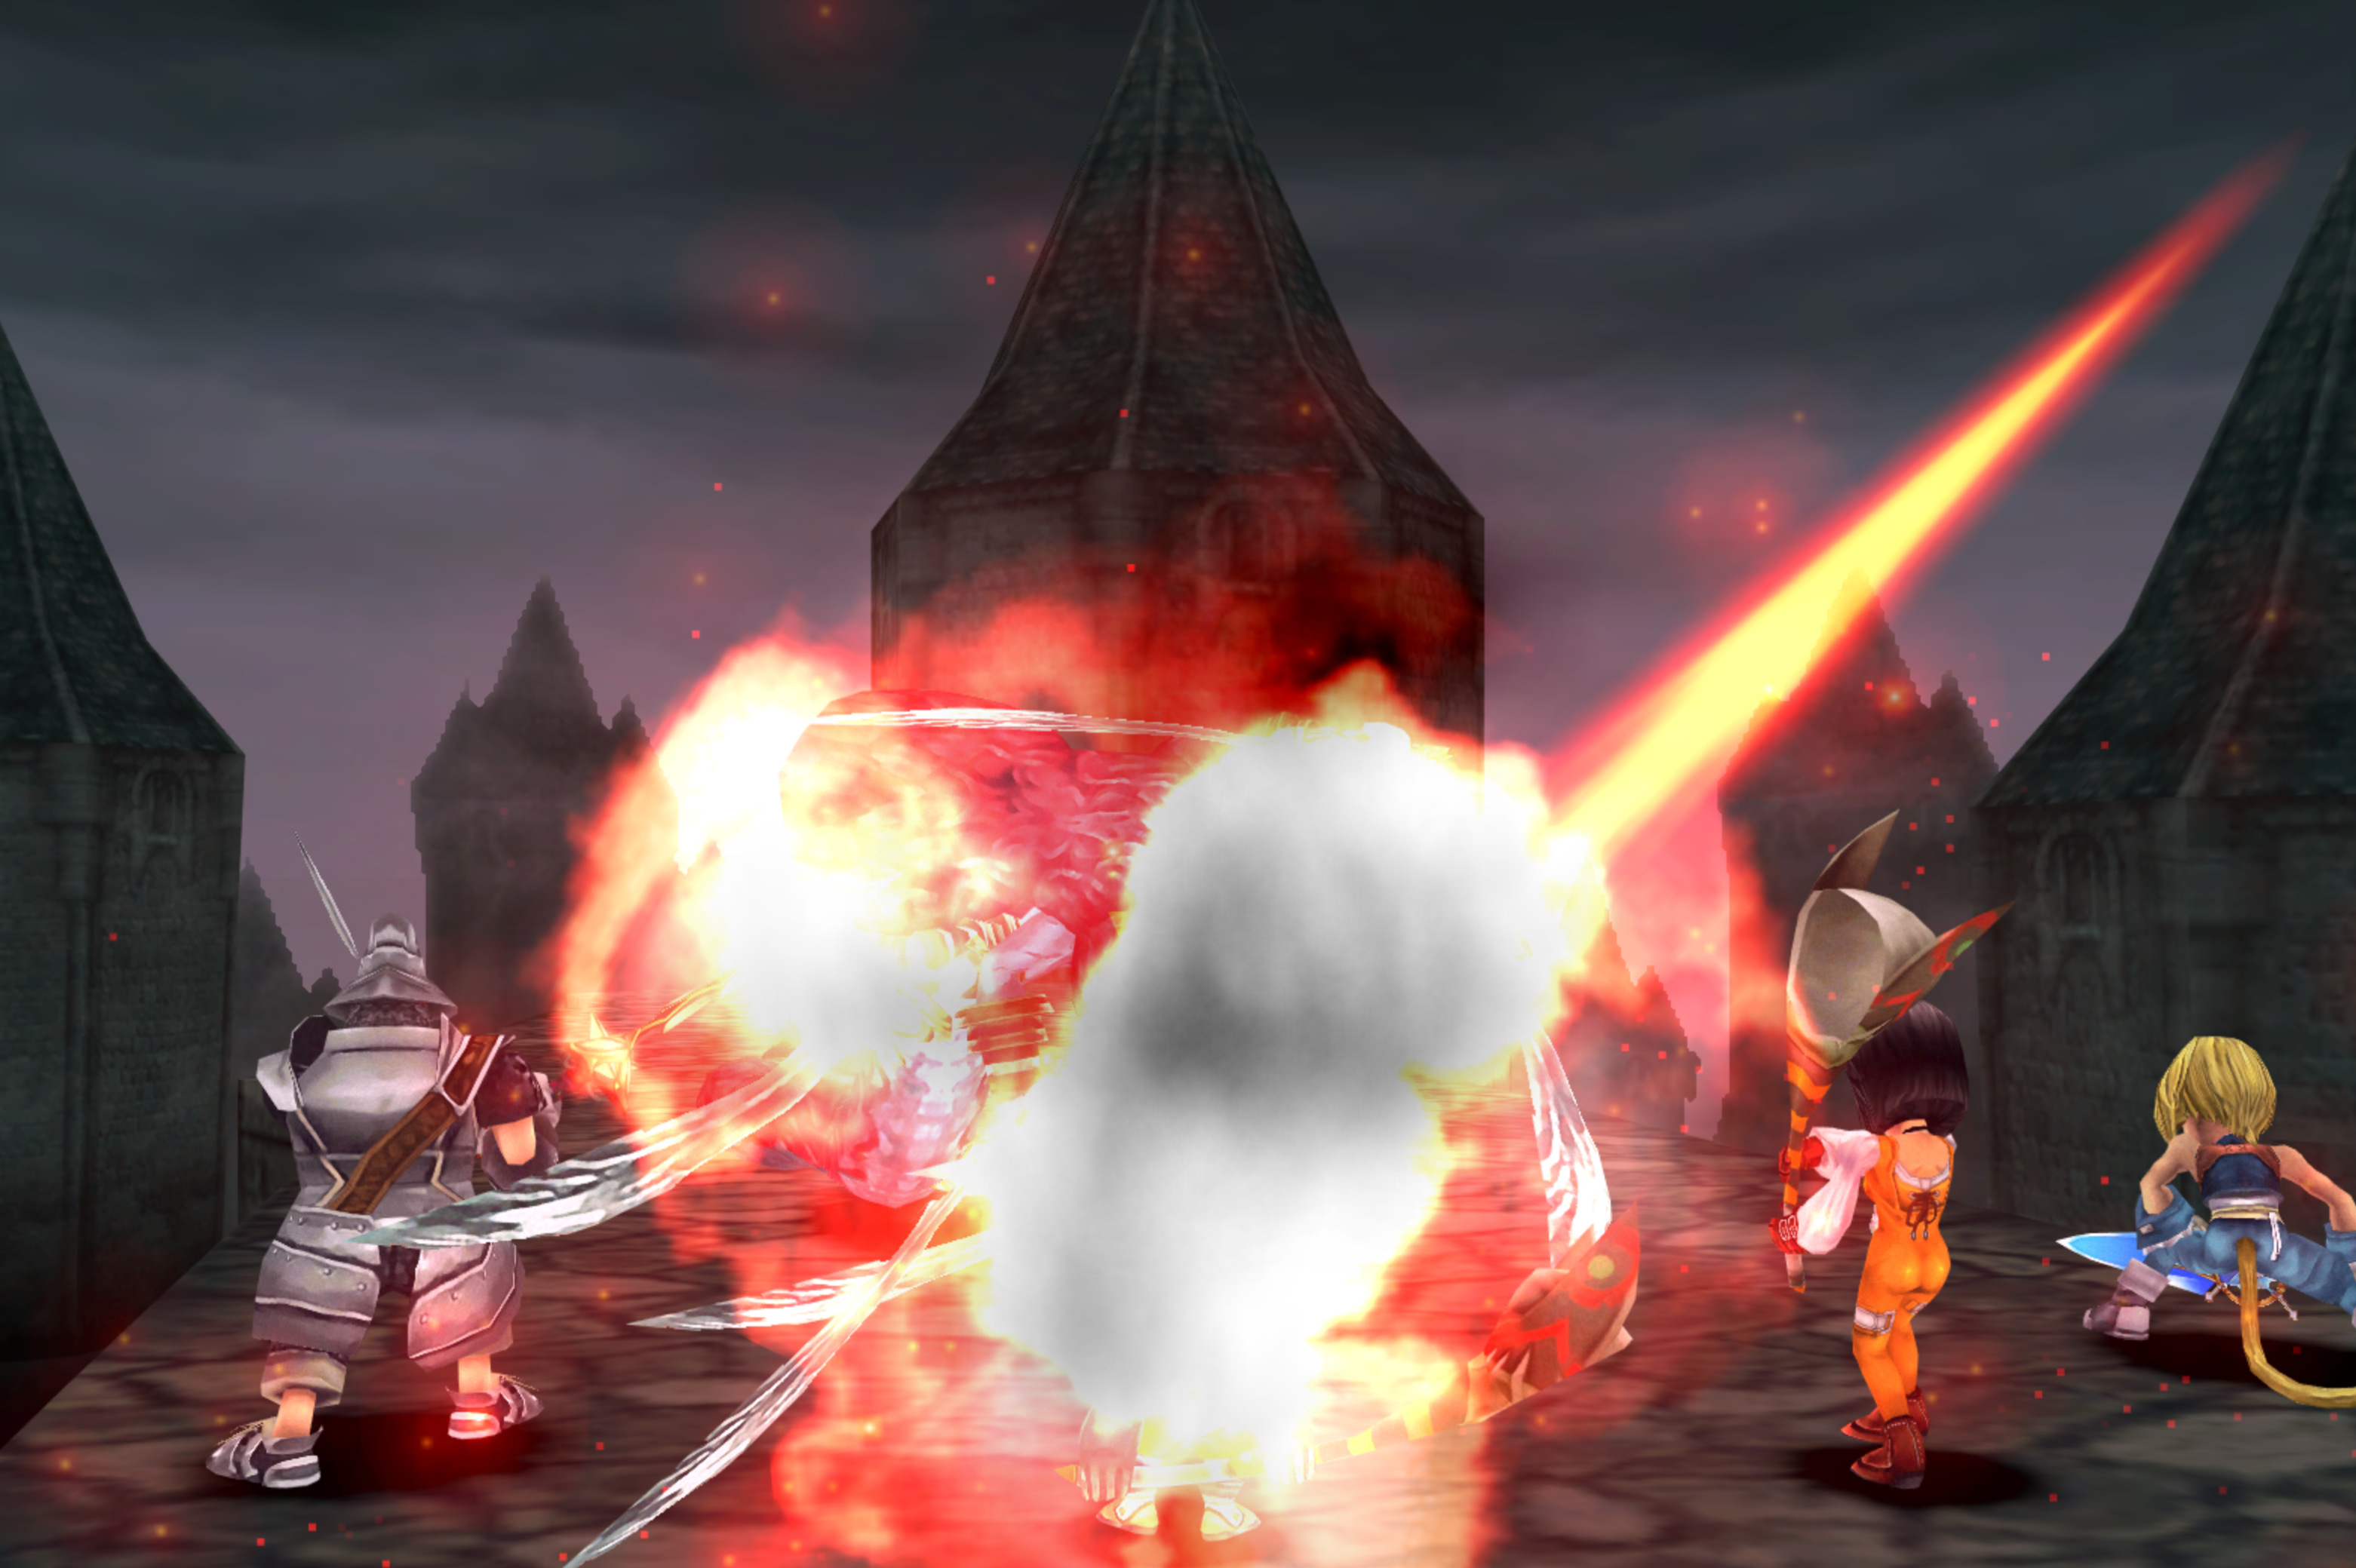 File:FFIX Flame Slash.png